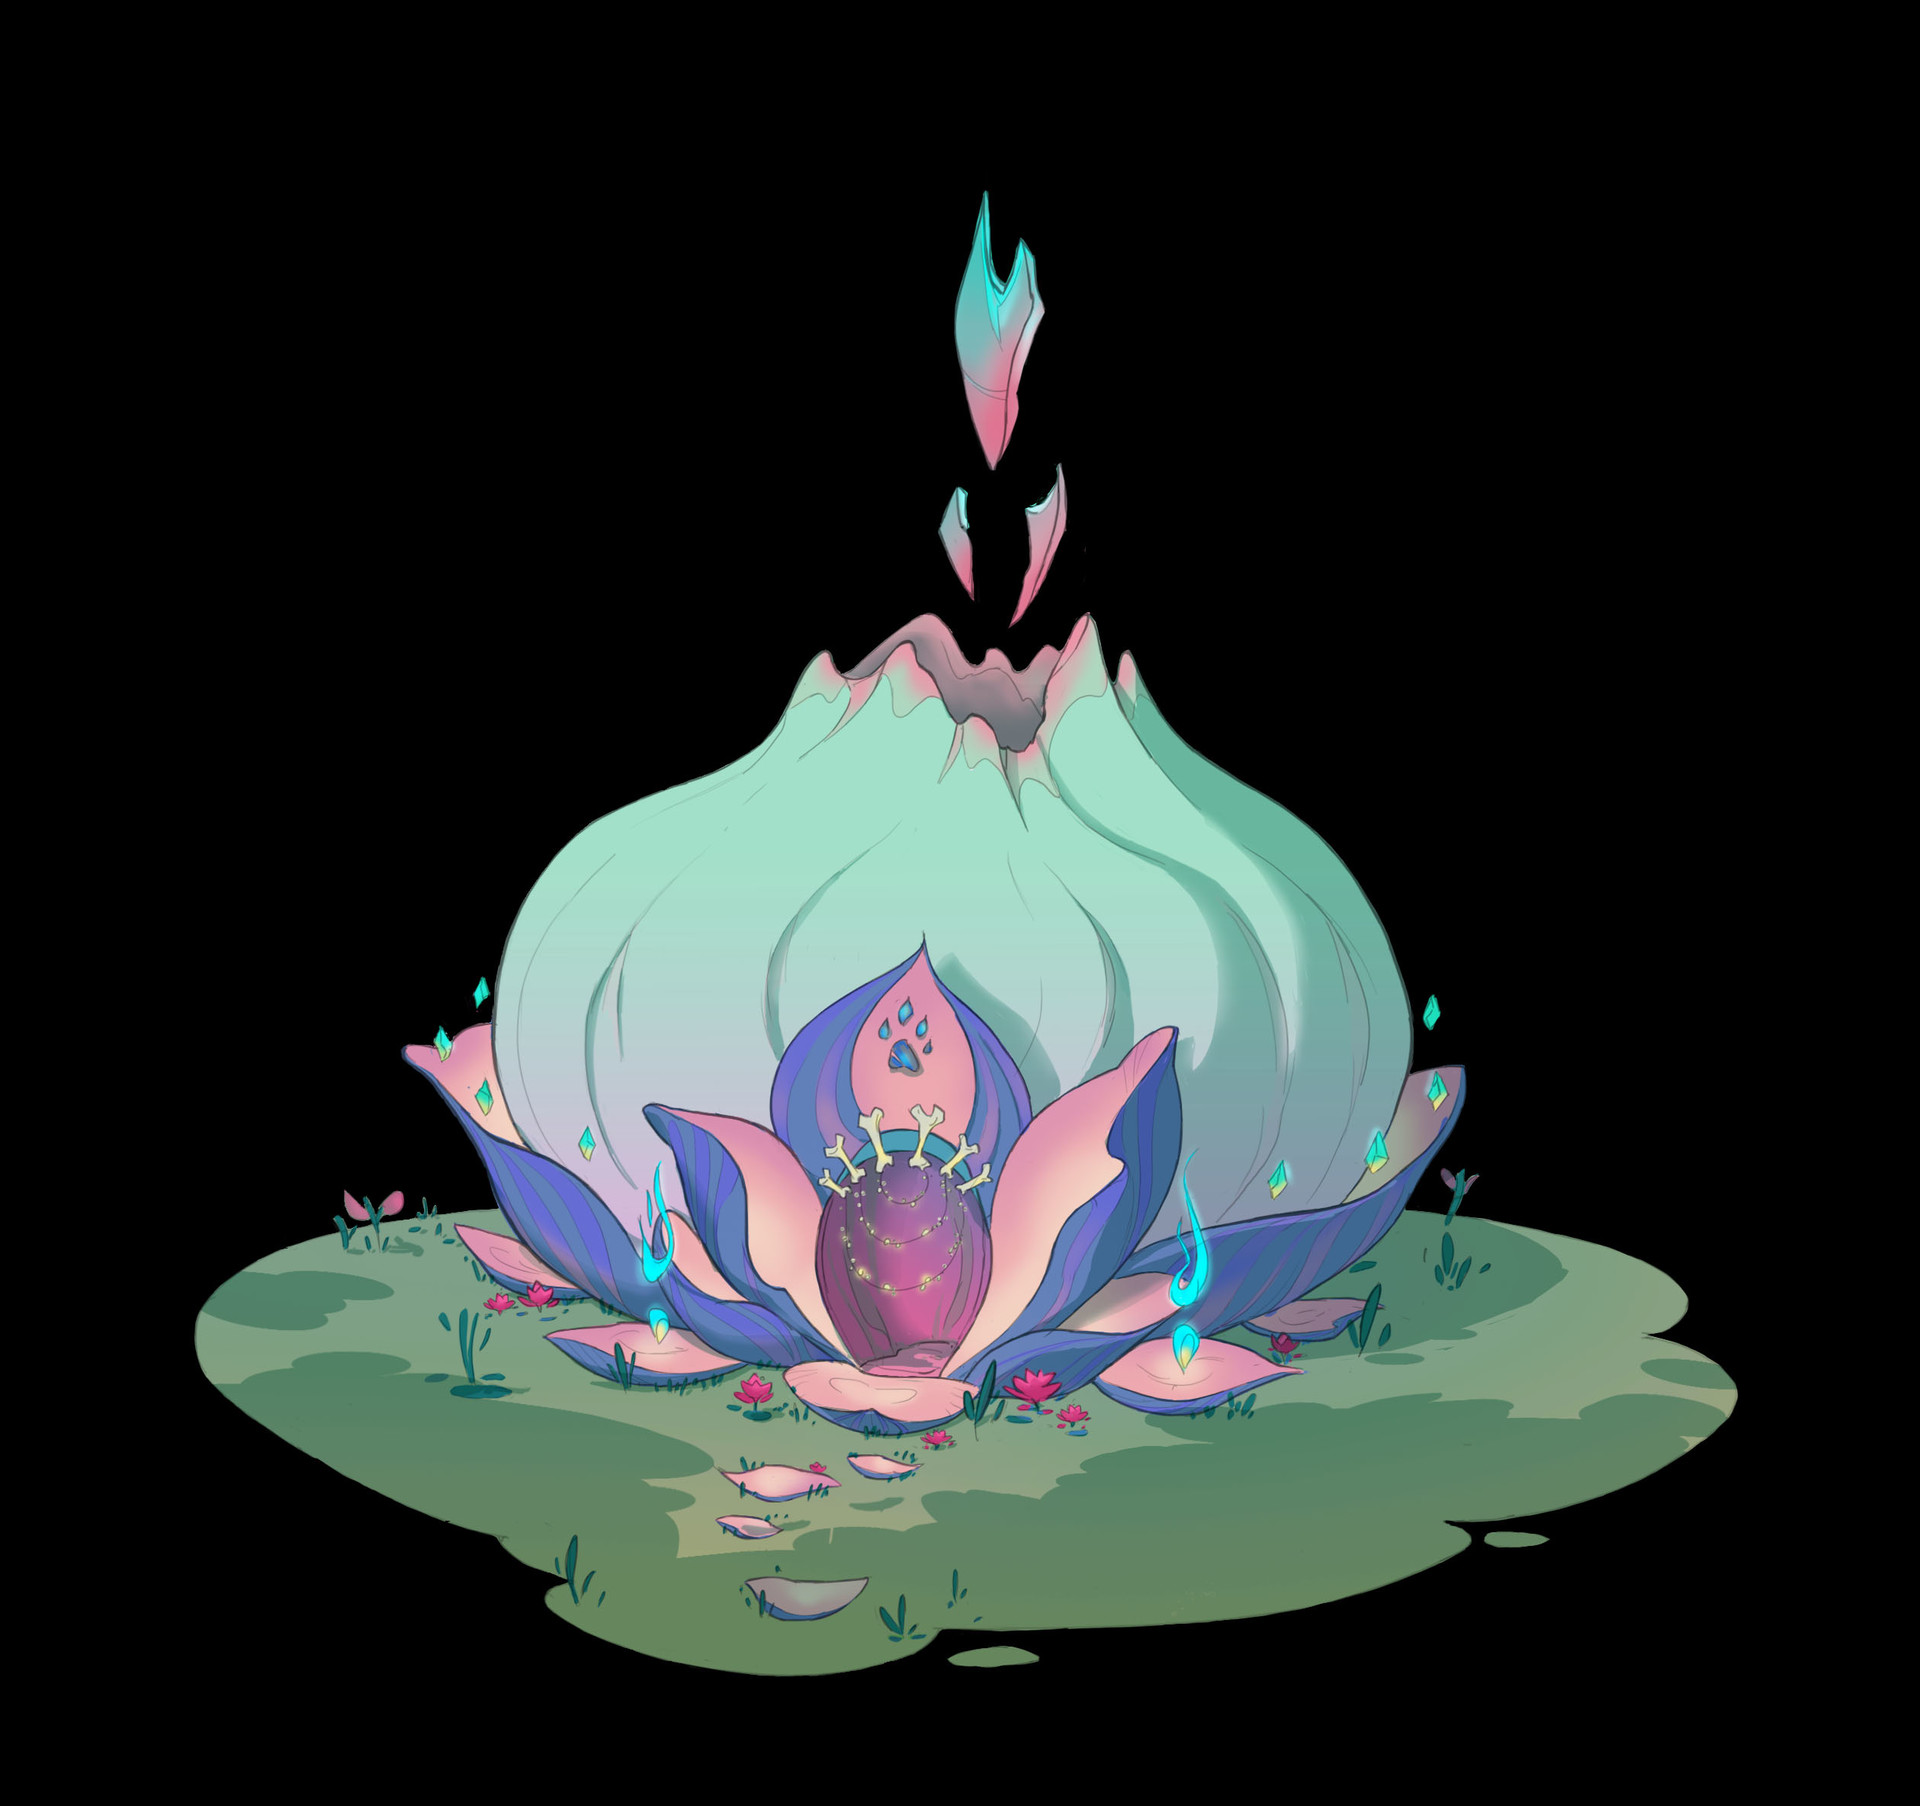 Iris tian exteriorshrine 02 08